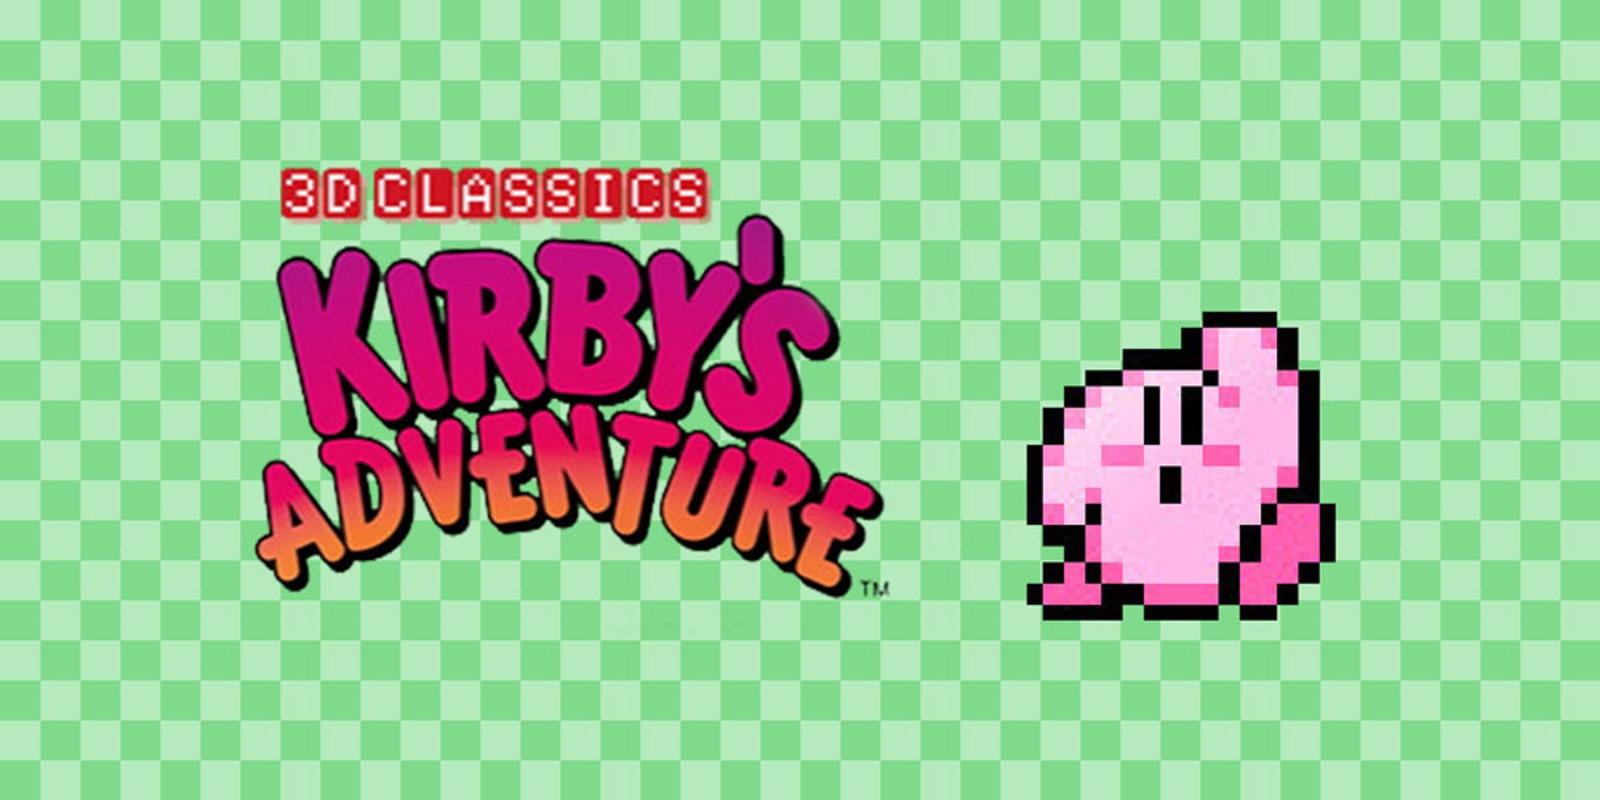 3d Classics Kirby S Adventure Nintendo 3ds Download Software Games Nintendo